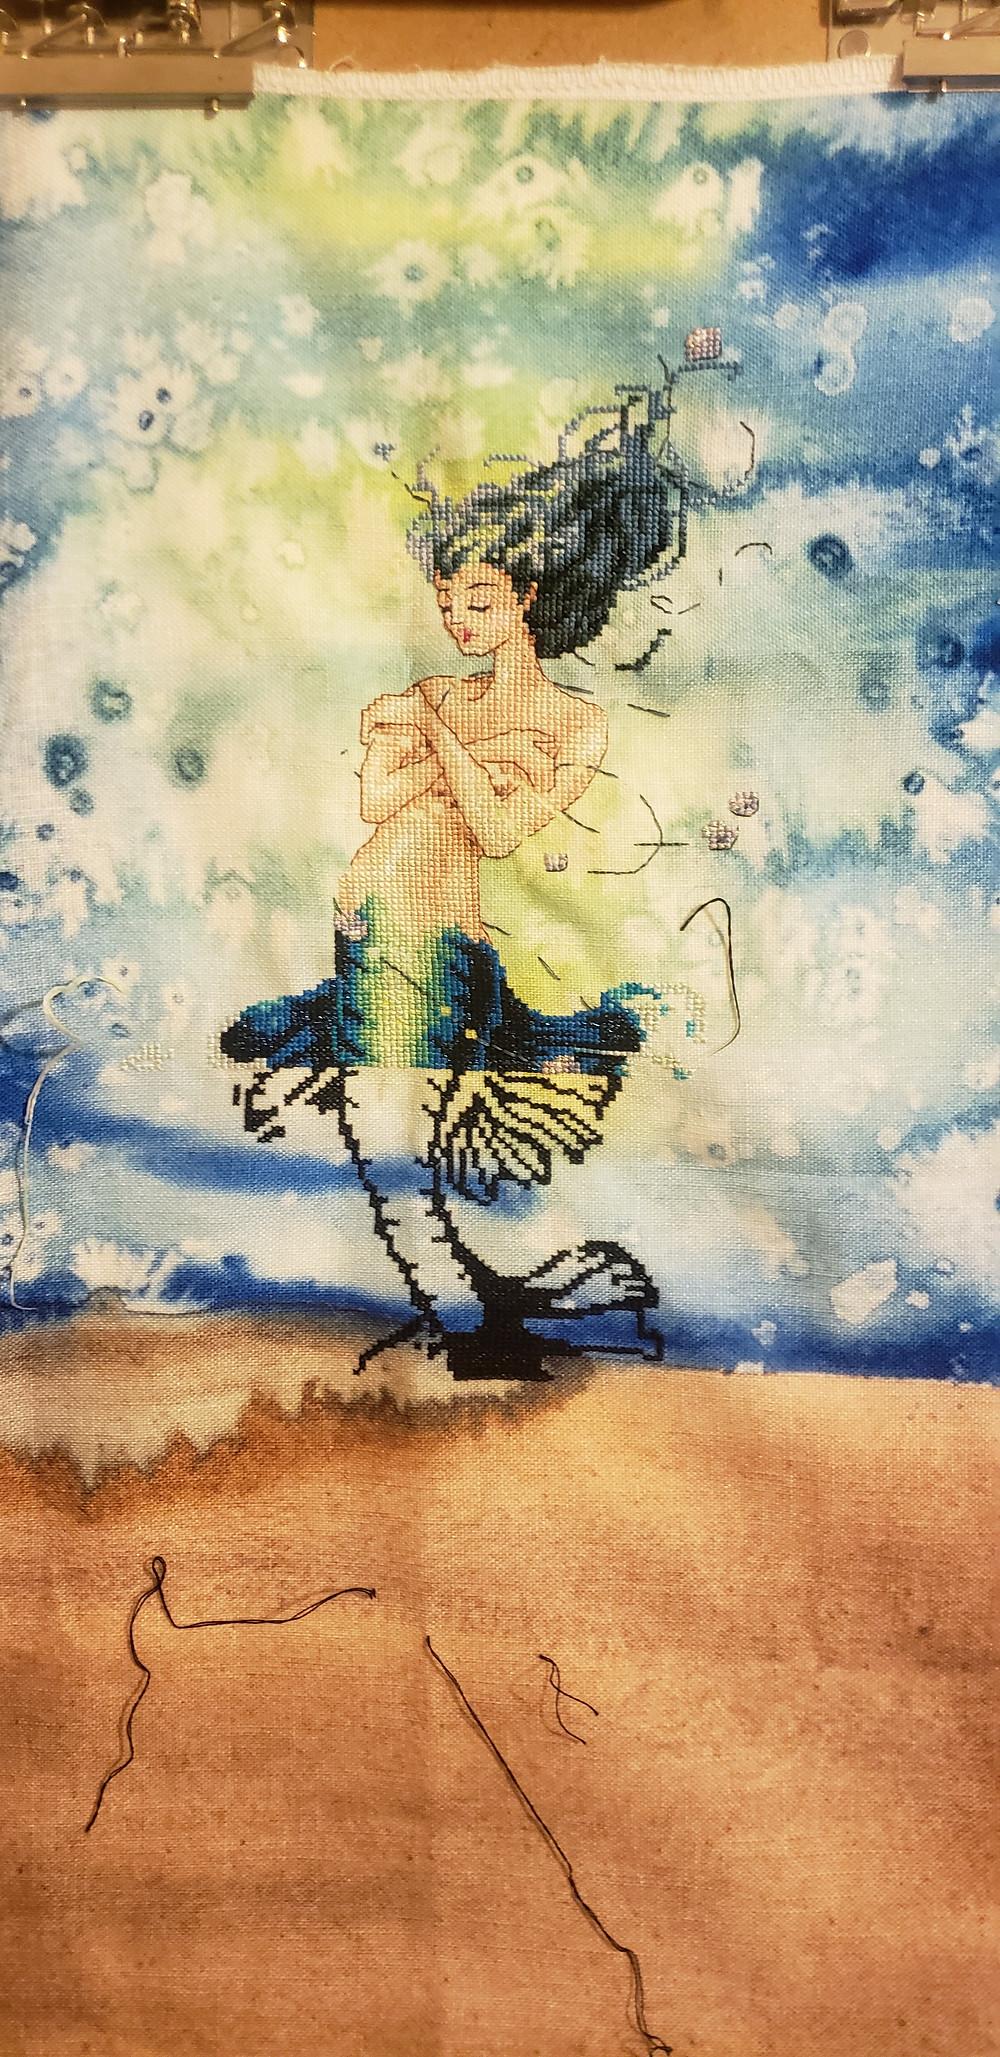 Mirabilia Aphrodite Mermaid on Under Da Sea fabric by Far Away Designs